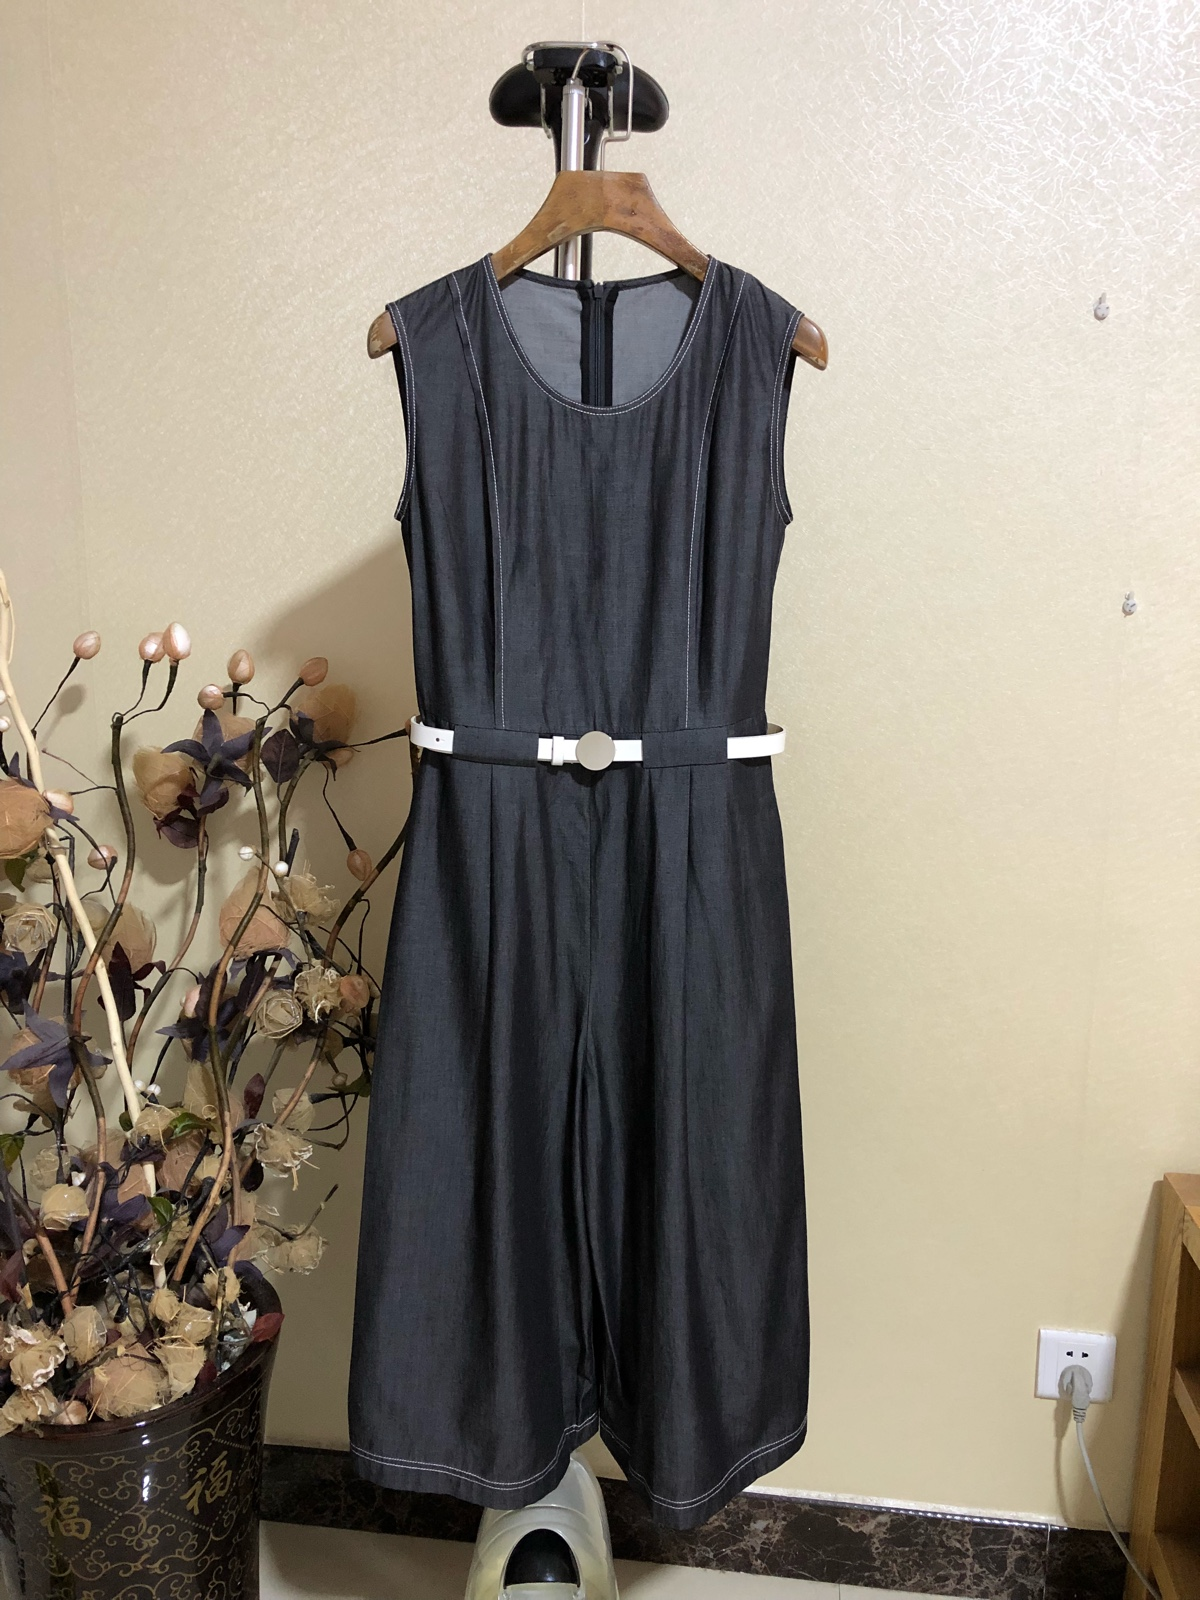 Kajia Xi / casual slim fit sleeveless one piece wide leg pants 9177 price tag 799